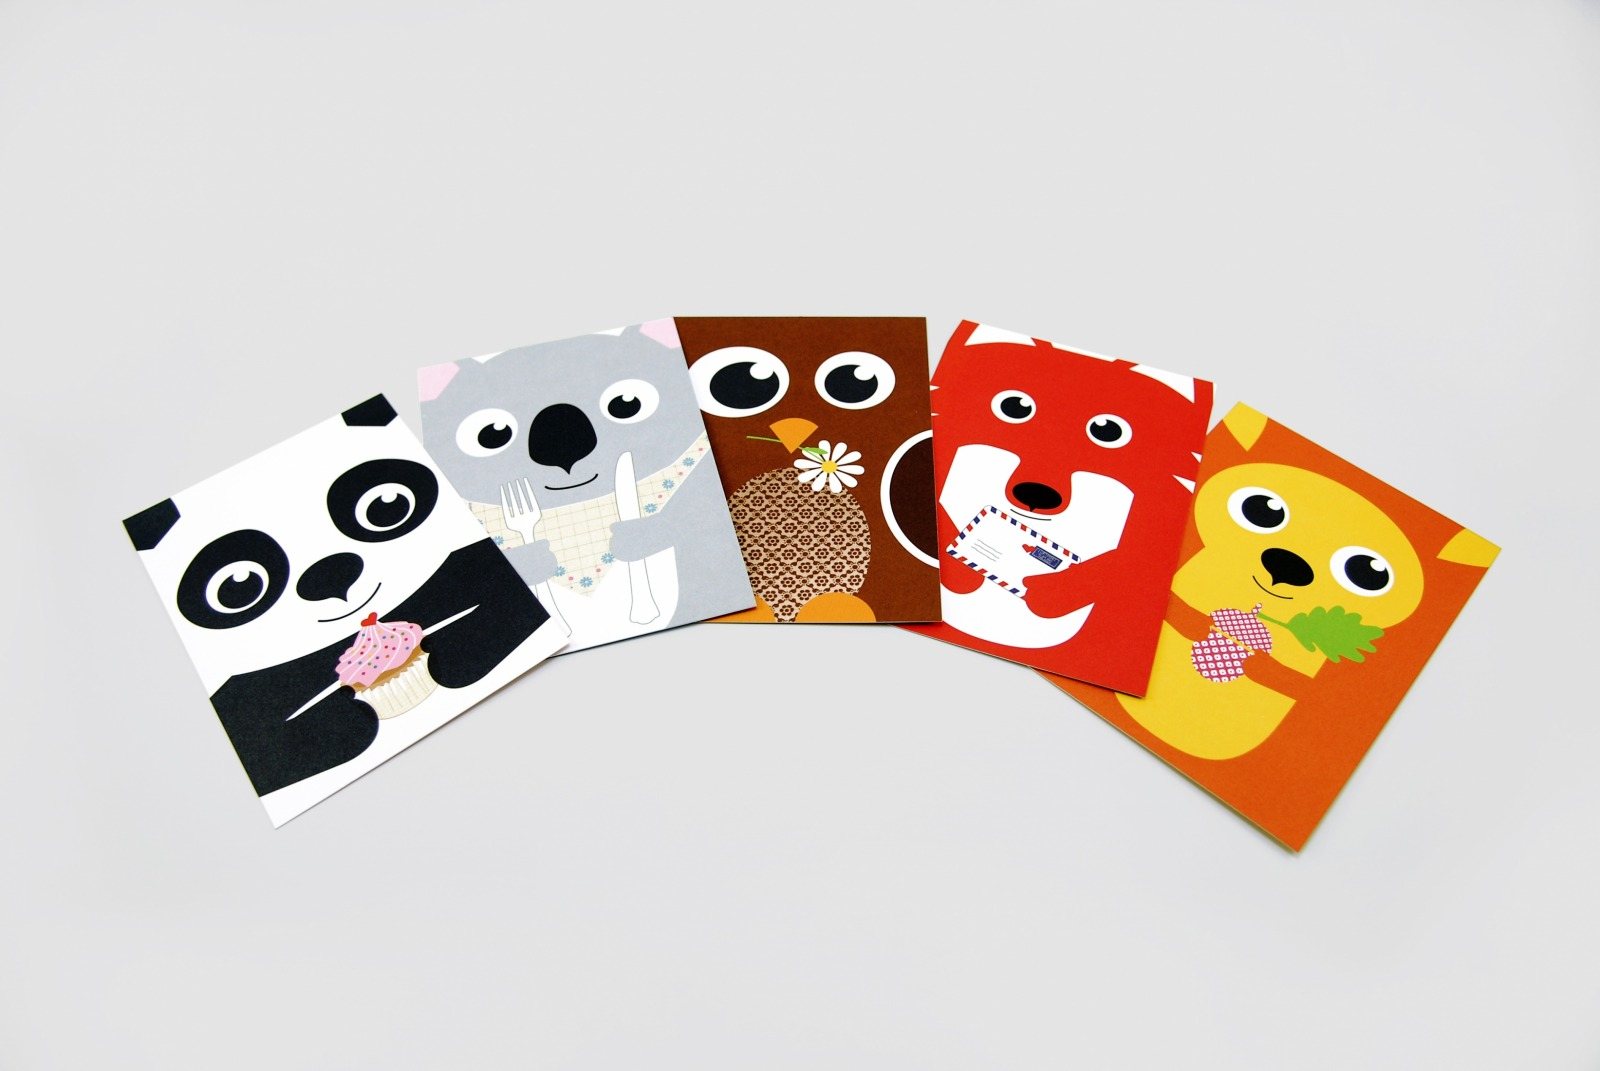 Postkarten Fuchs Panda Koala Spatz und - 1